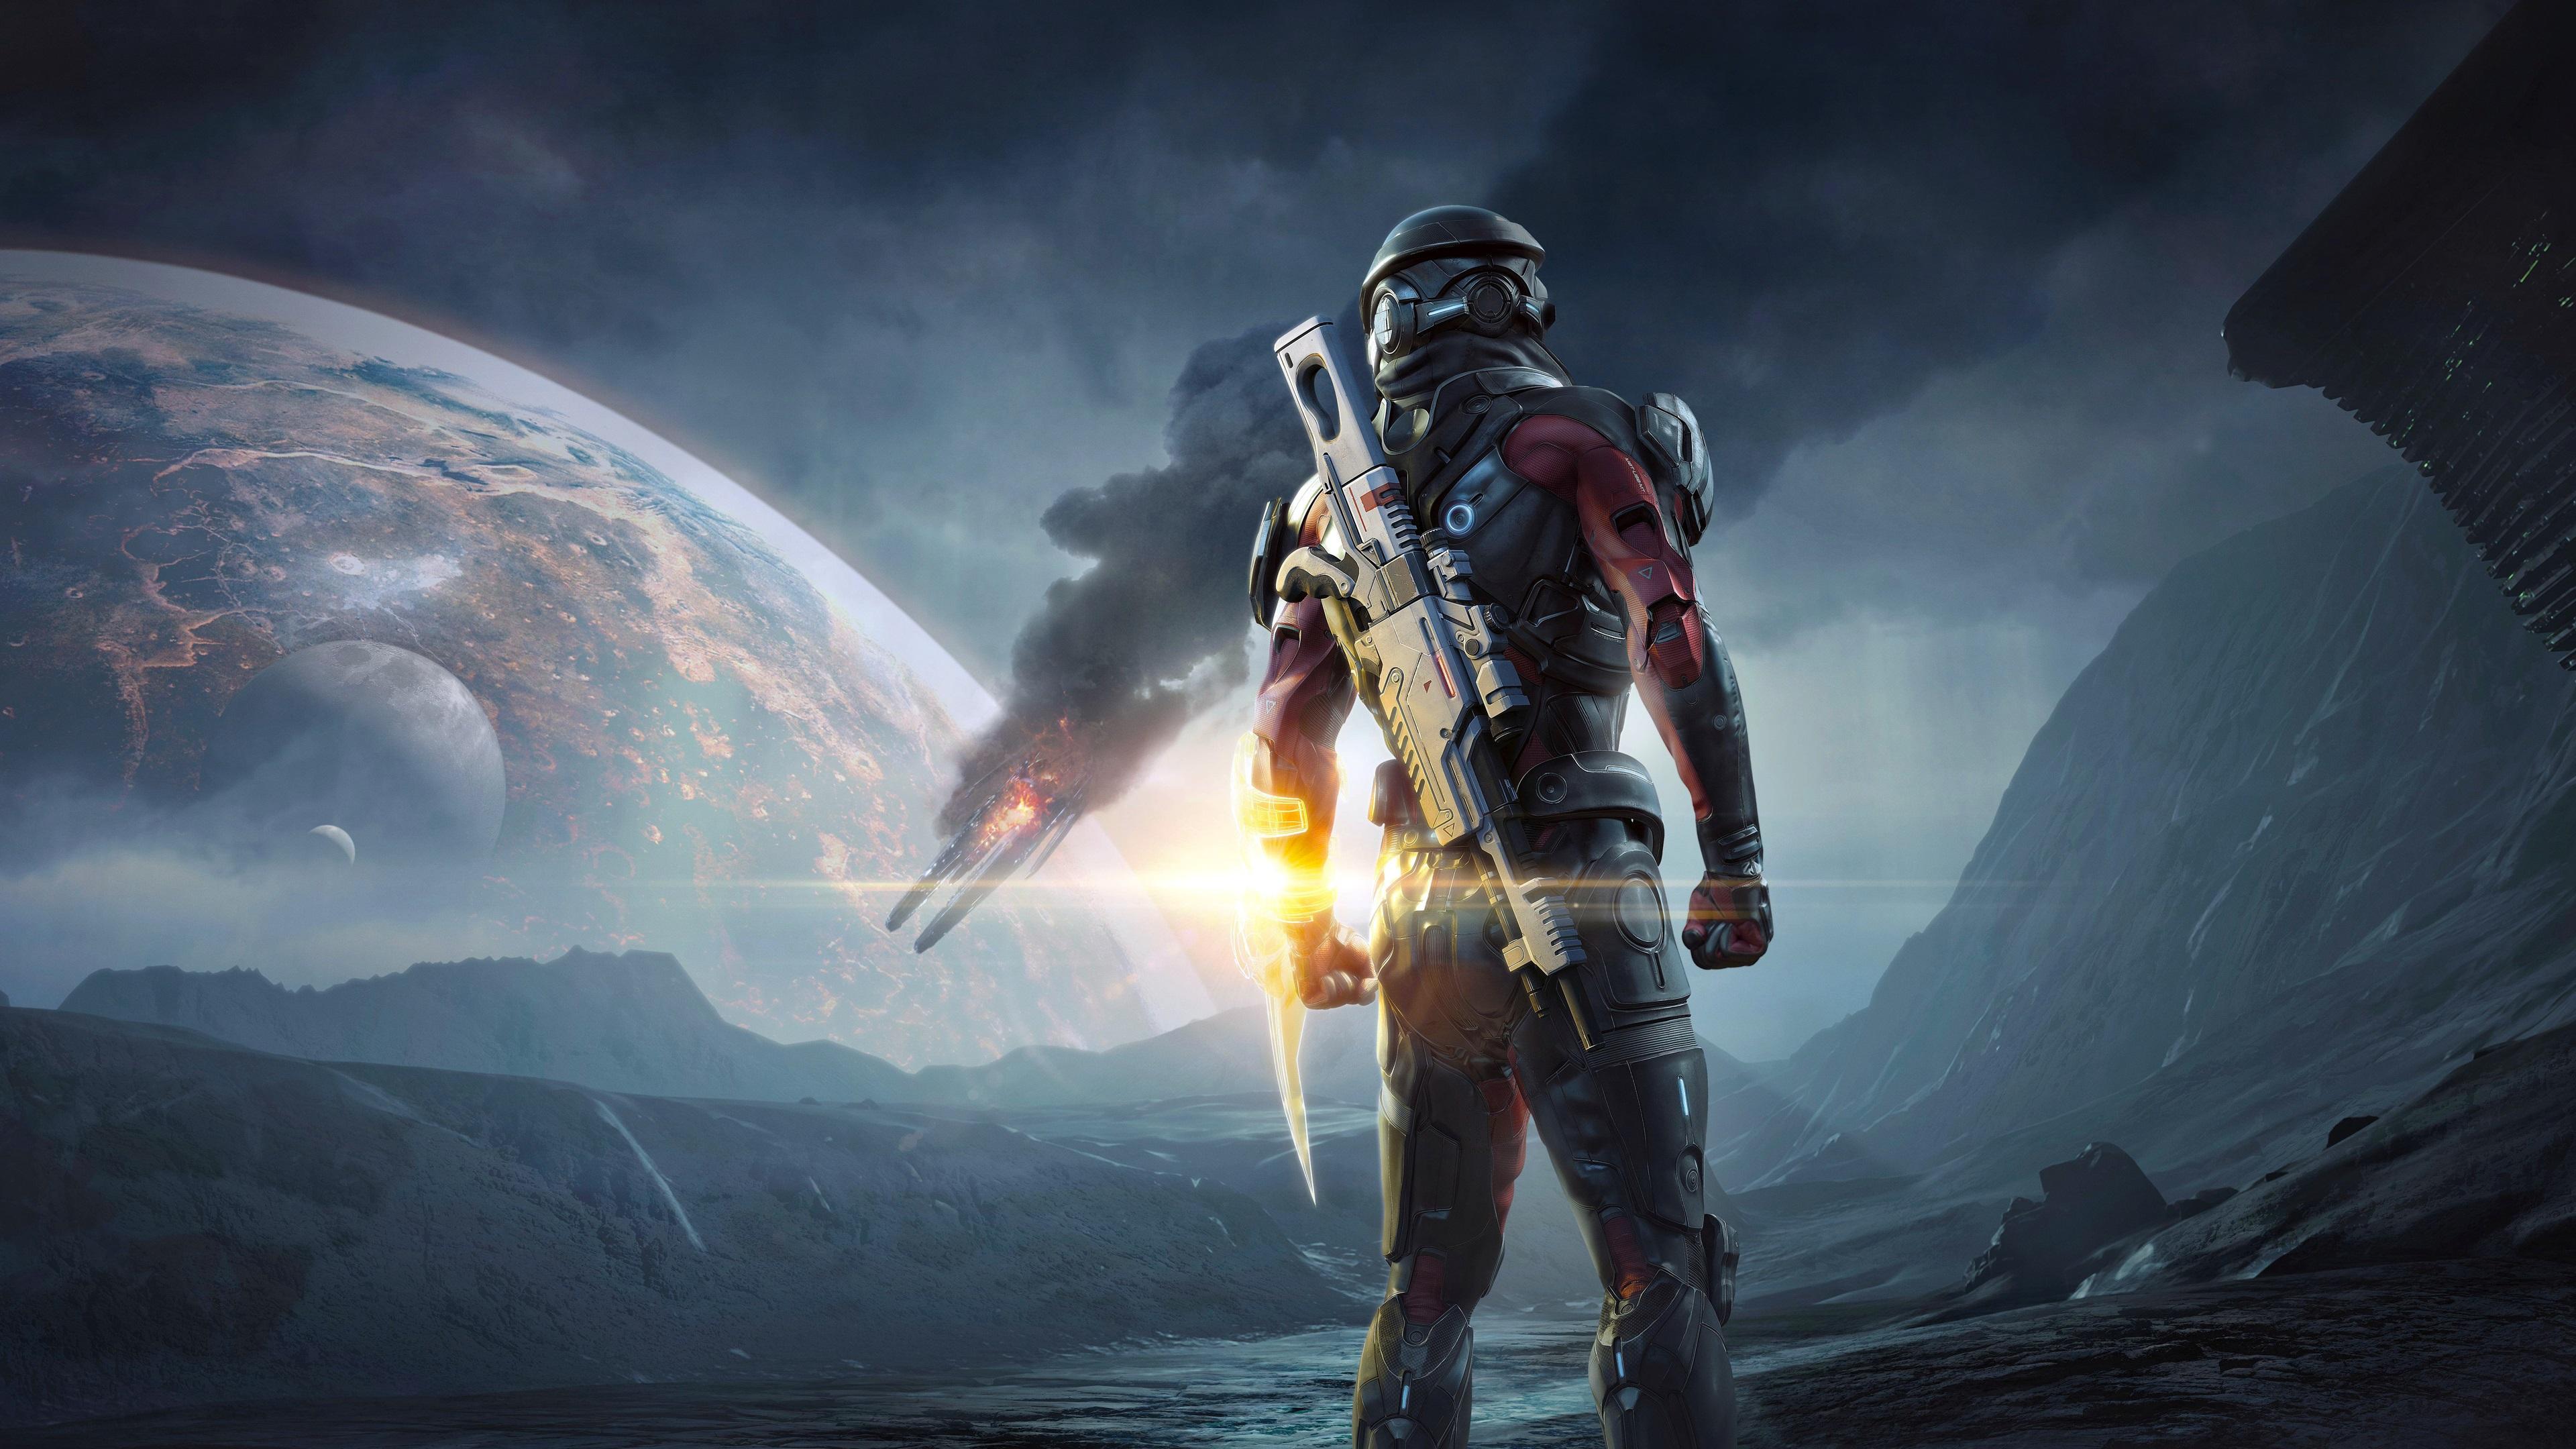 Fondos De Pantalla Mass Effect: Andromeda, Juegos De PS4